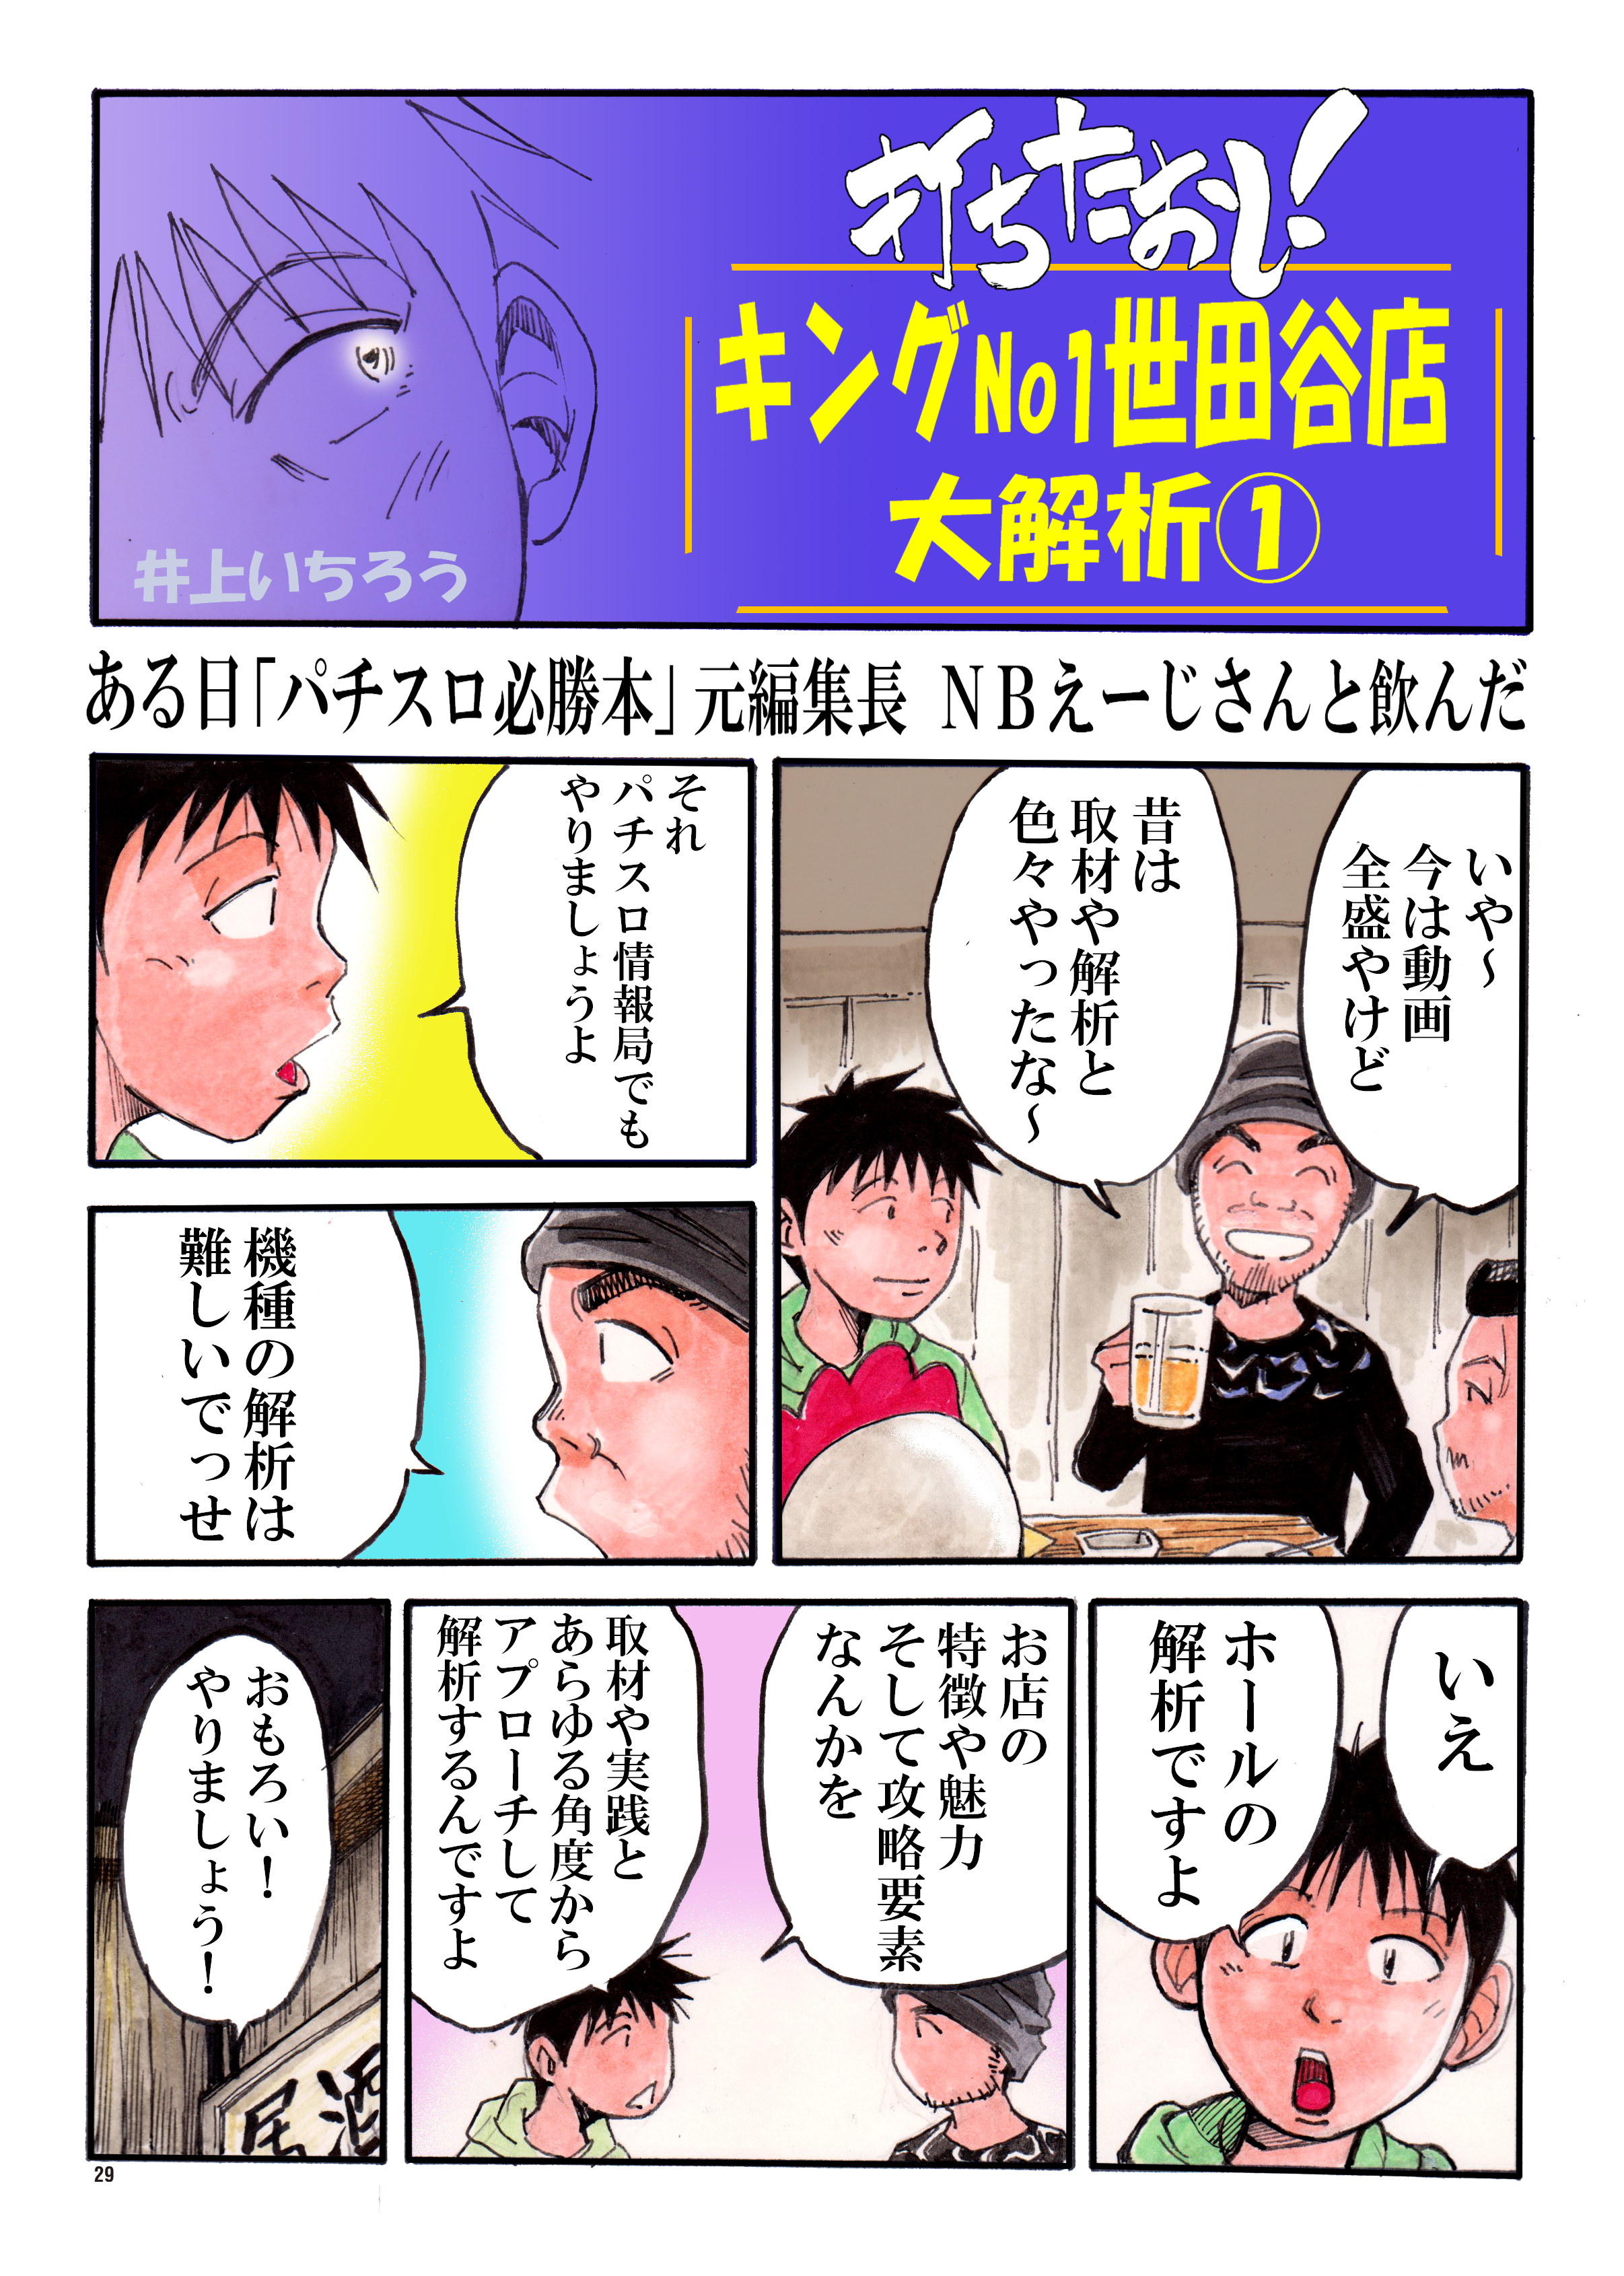 vol.1-1キング大解析